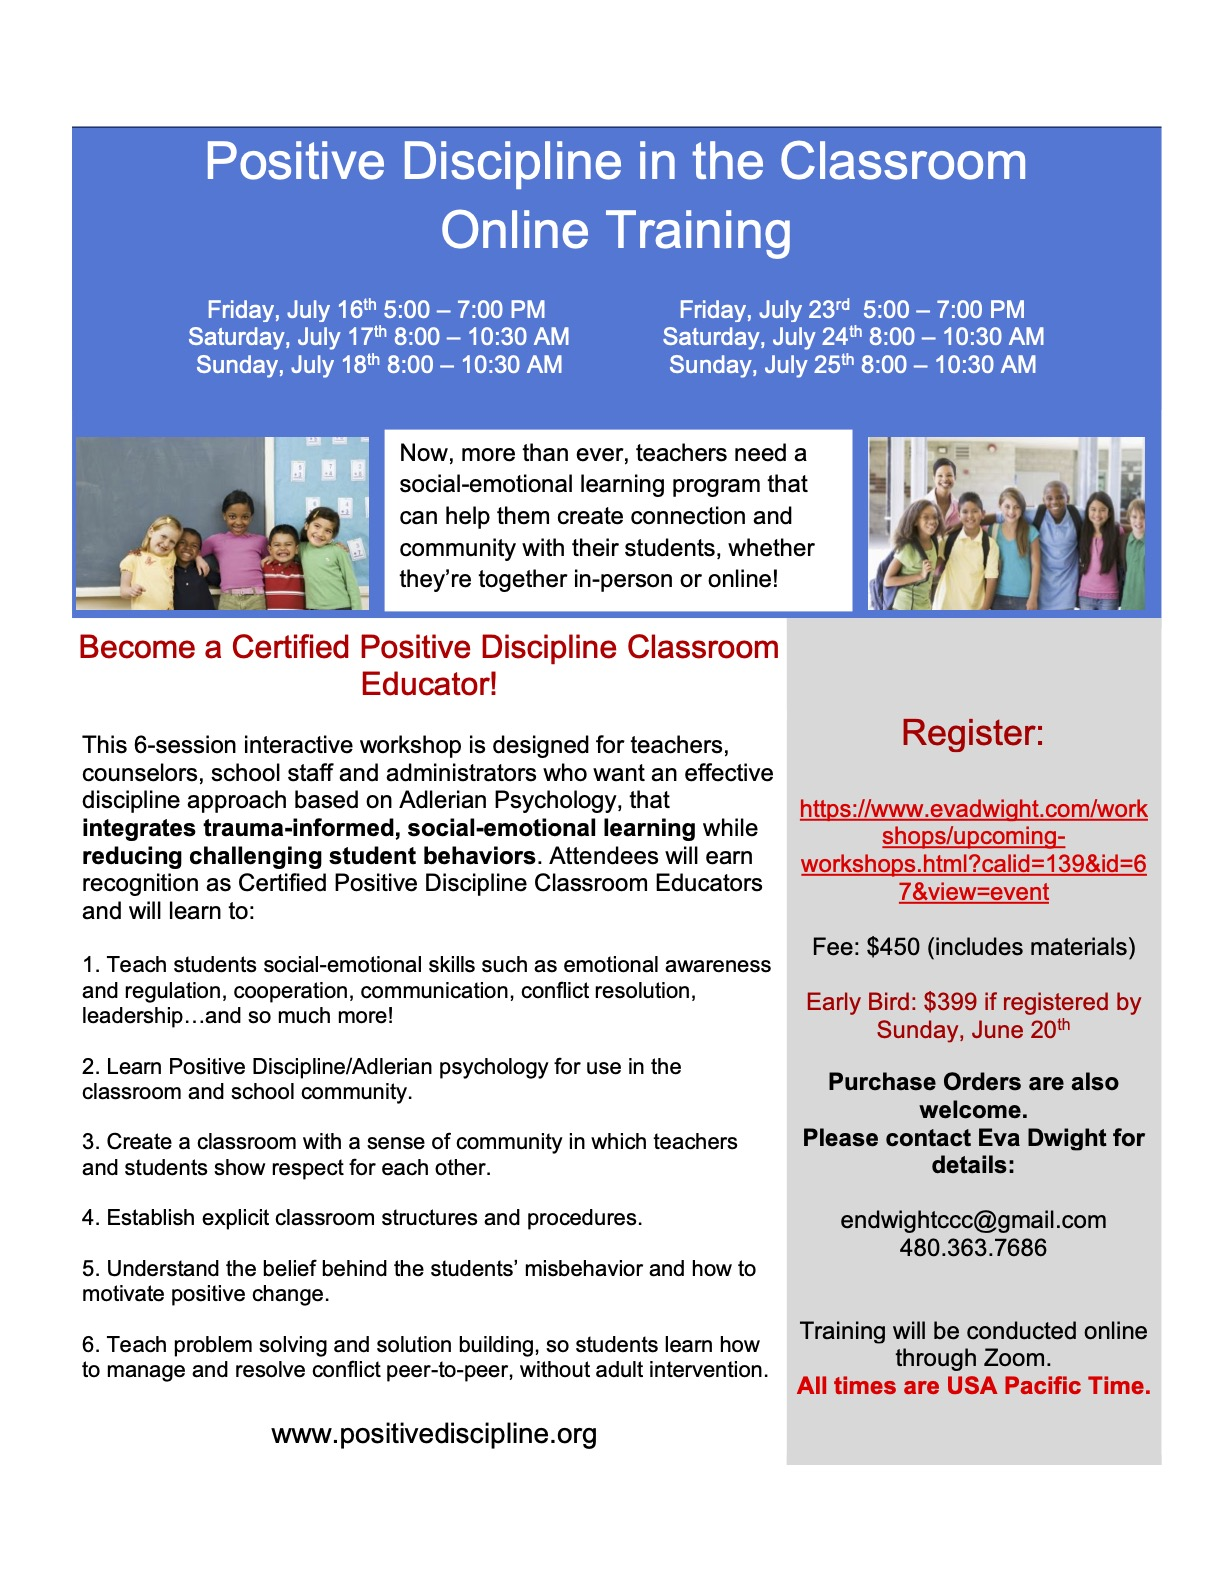 Pos Disc Classroom July 2021 flyer